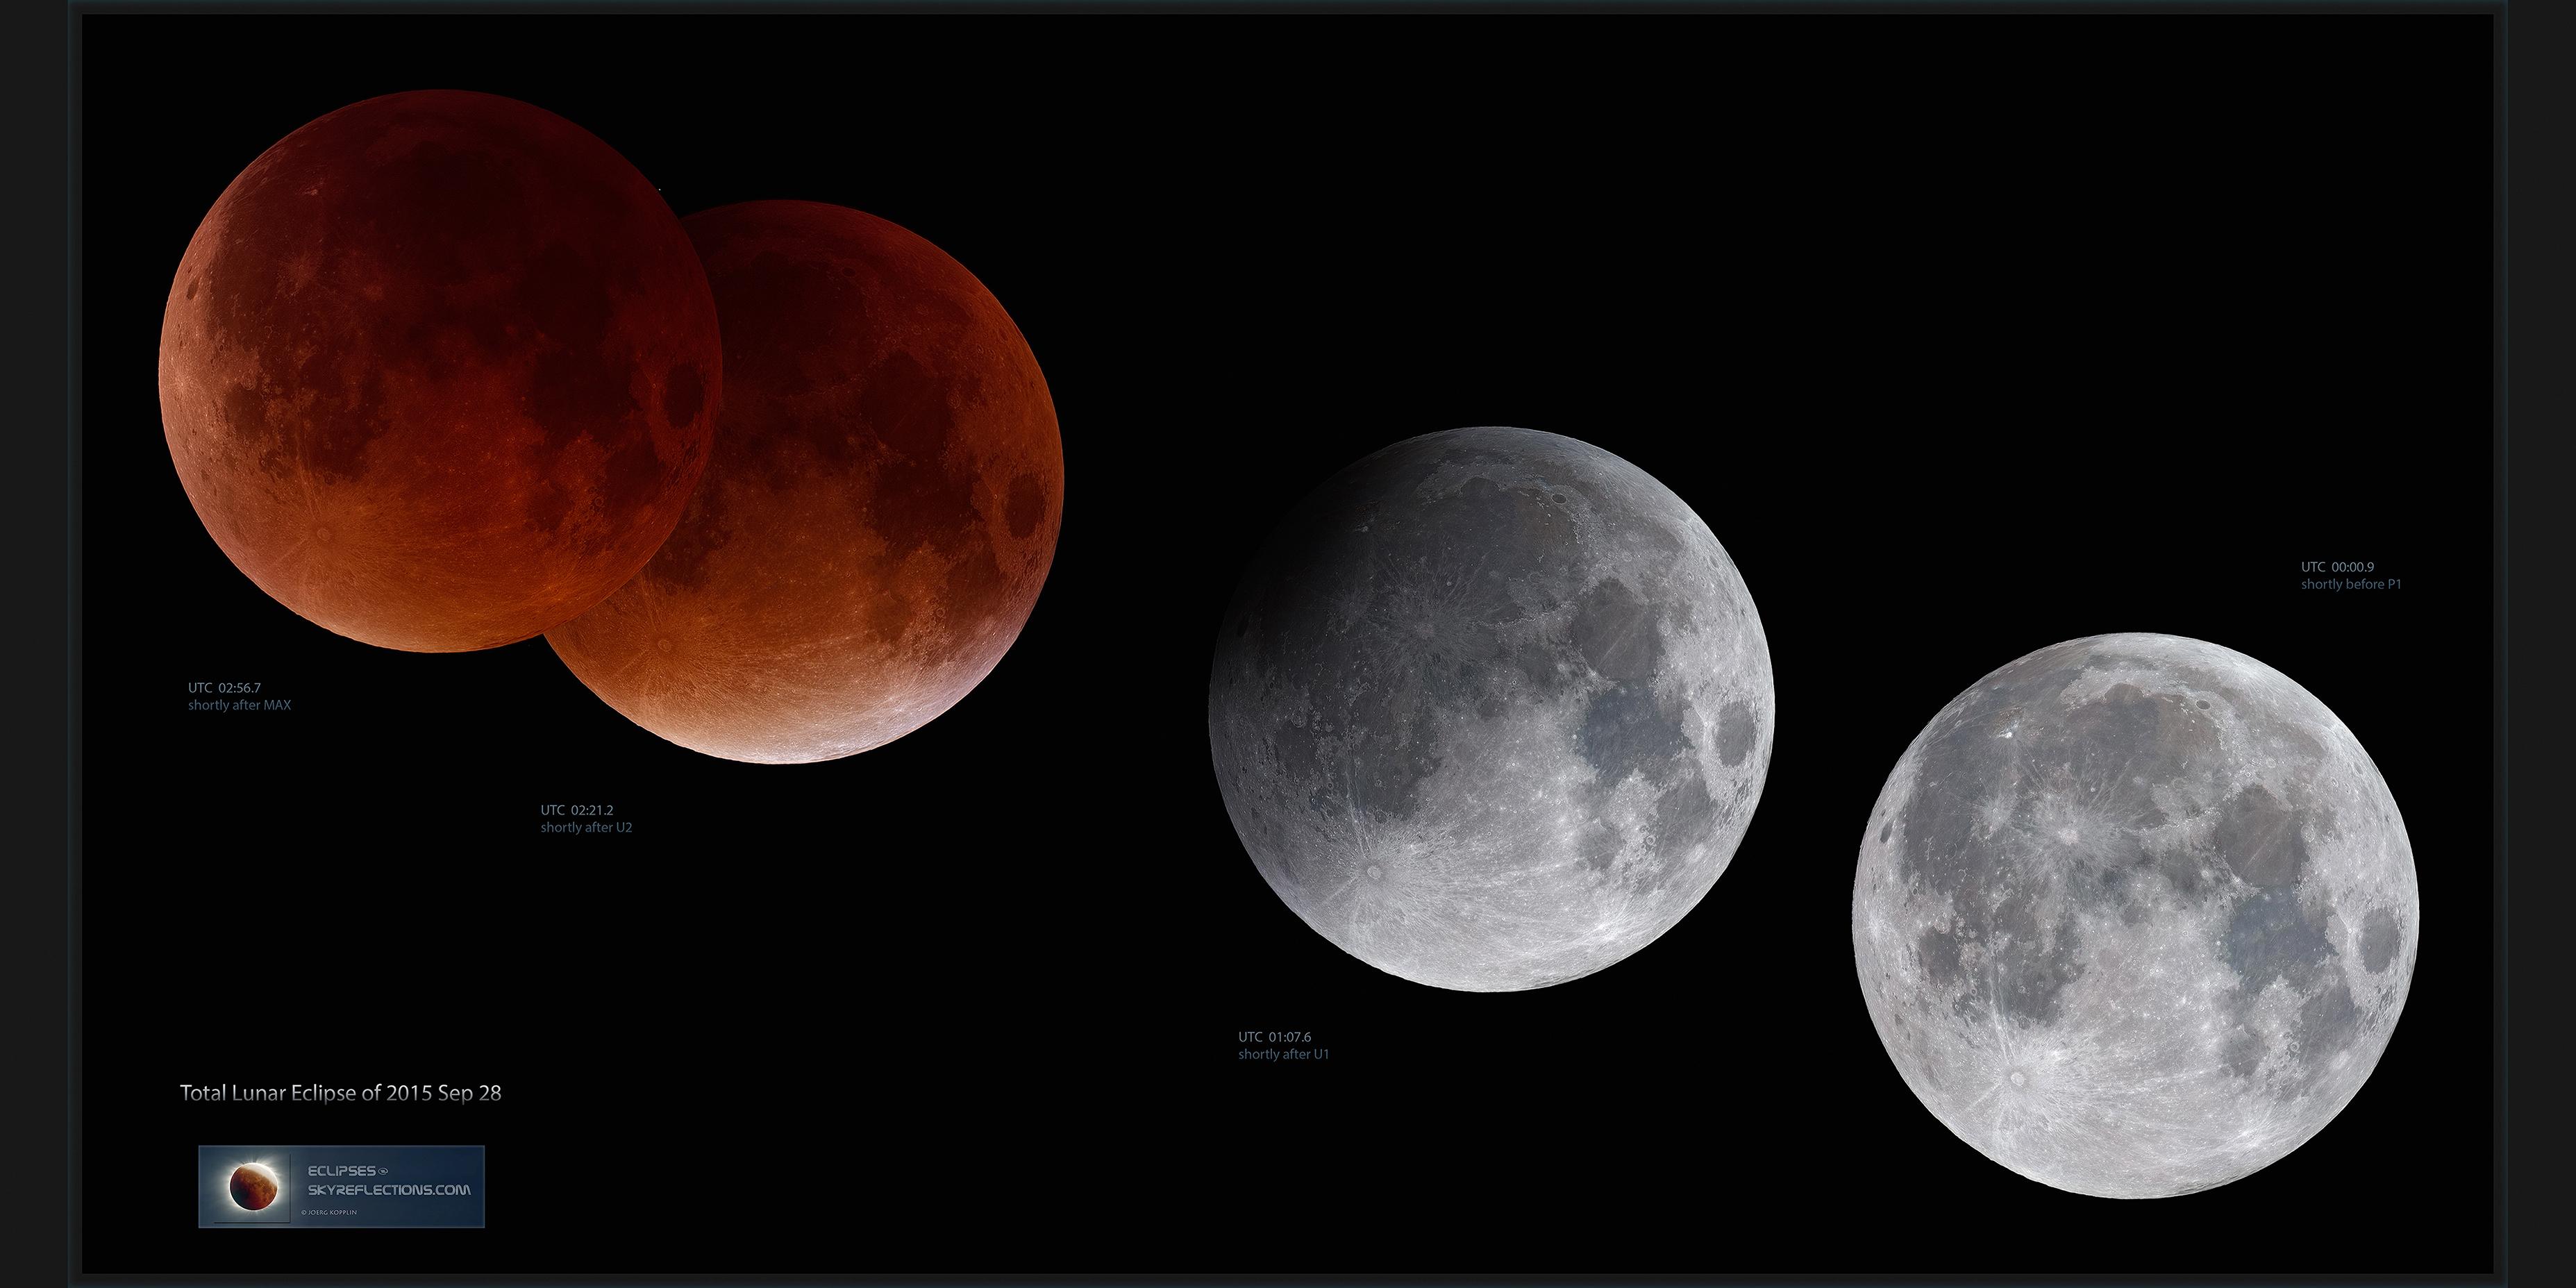 Moon_2015Sep28_comp_col1zpan12_33_300